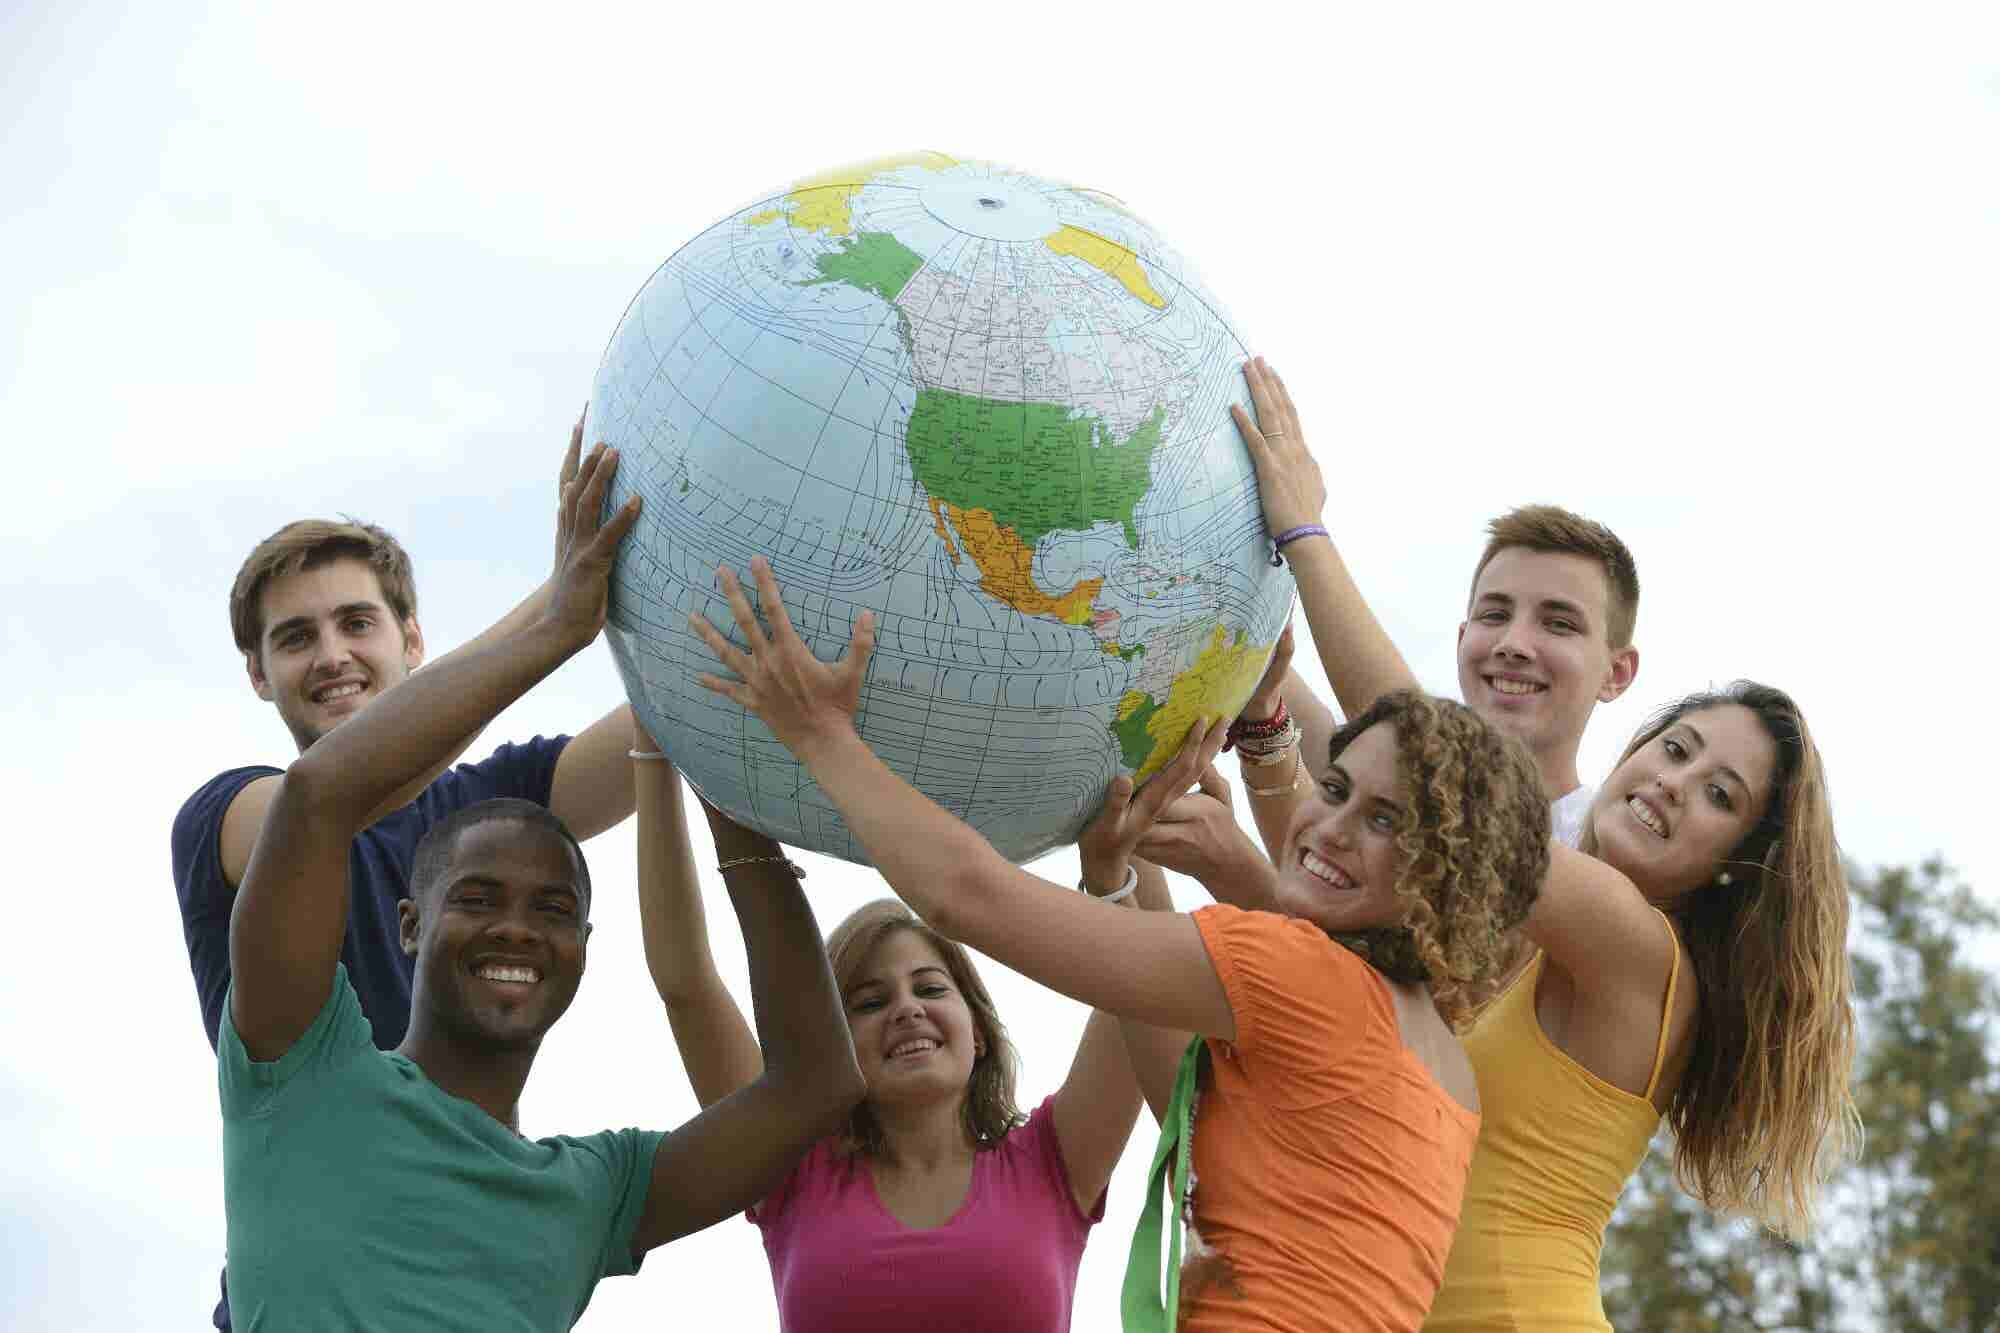 ¿Quieres salvar al mundo? I3Latam impulsa tu negocio social!